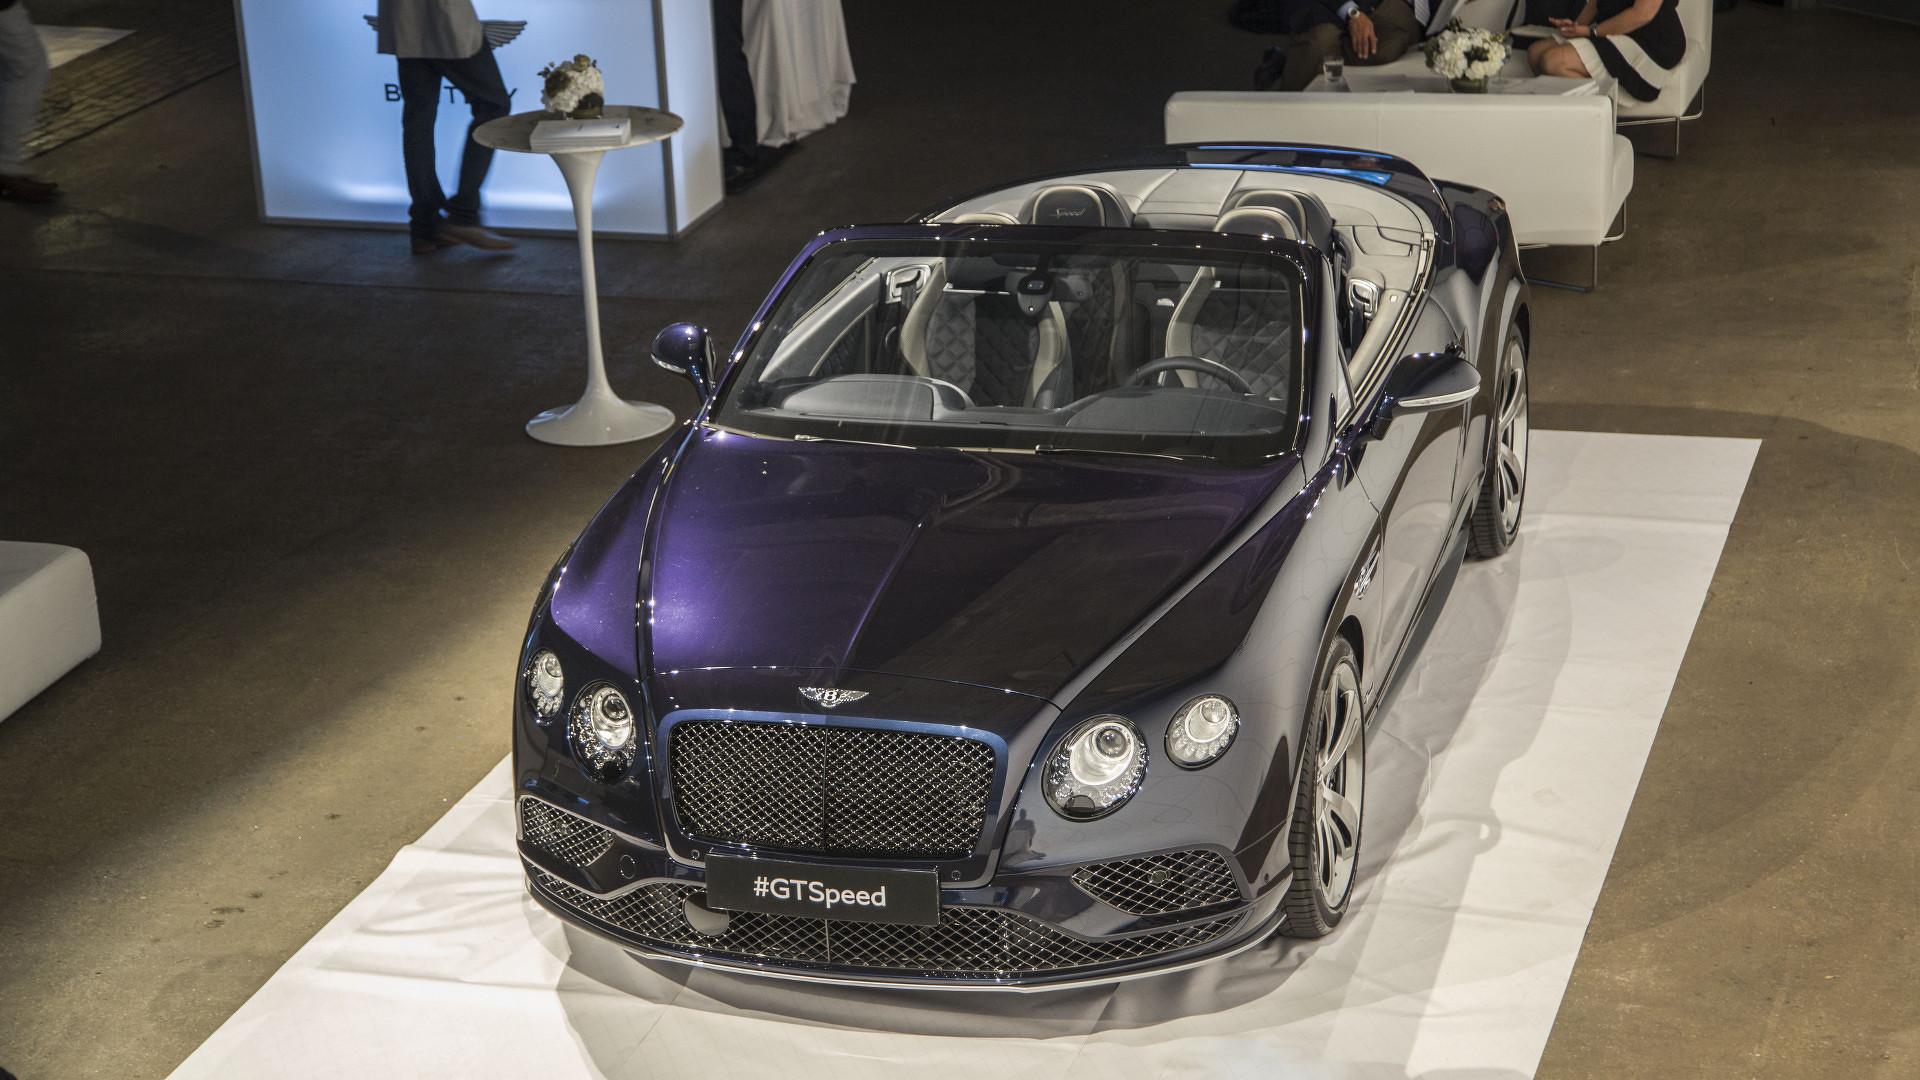 2917-bentley-gt-speed-unveiling-event (5)-autonovosti.me-5